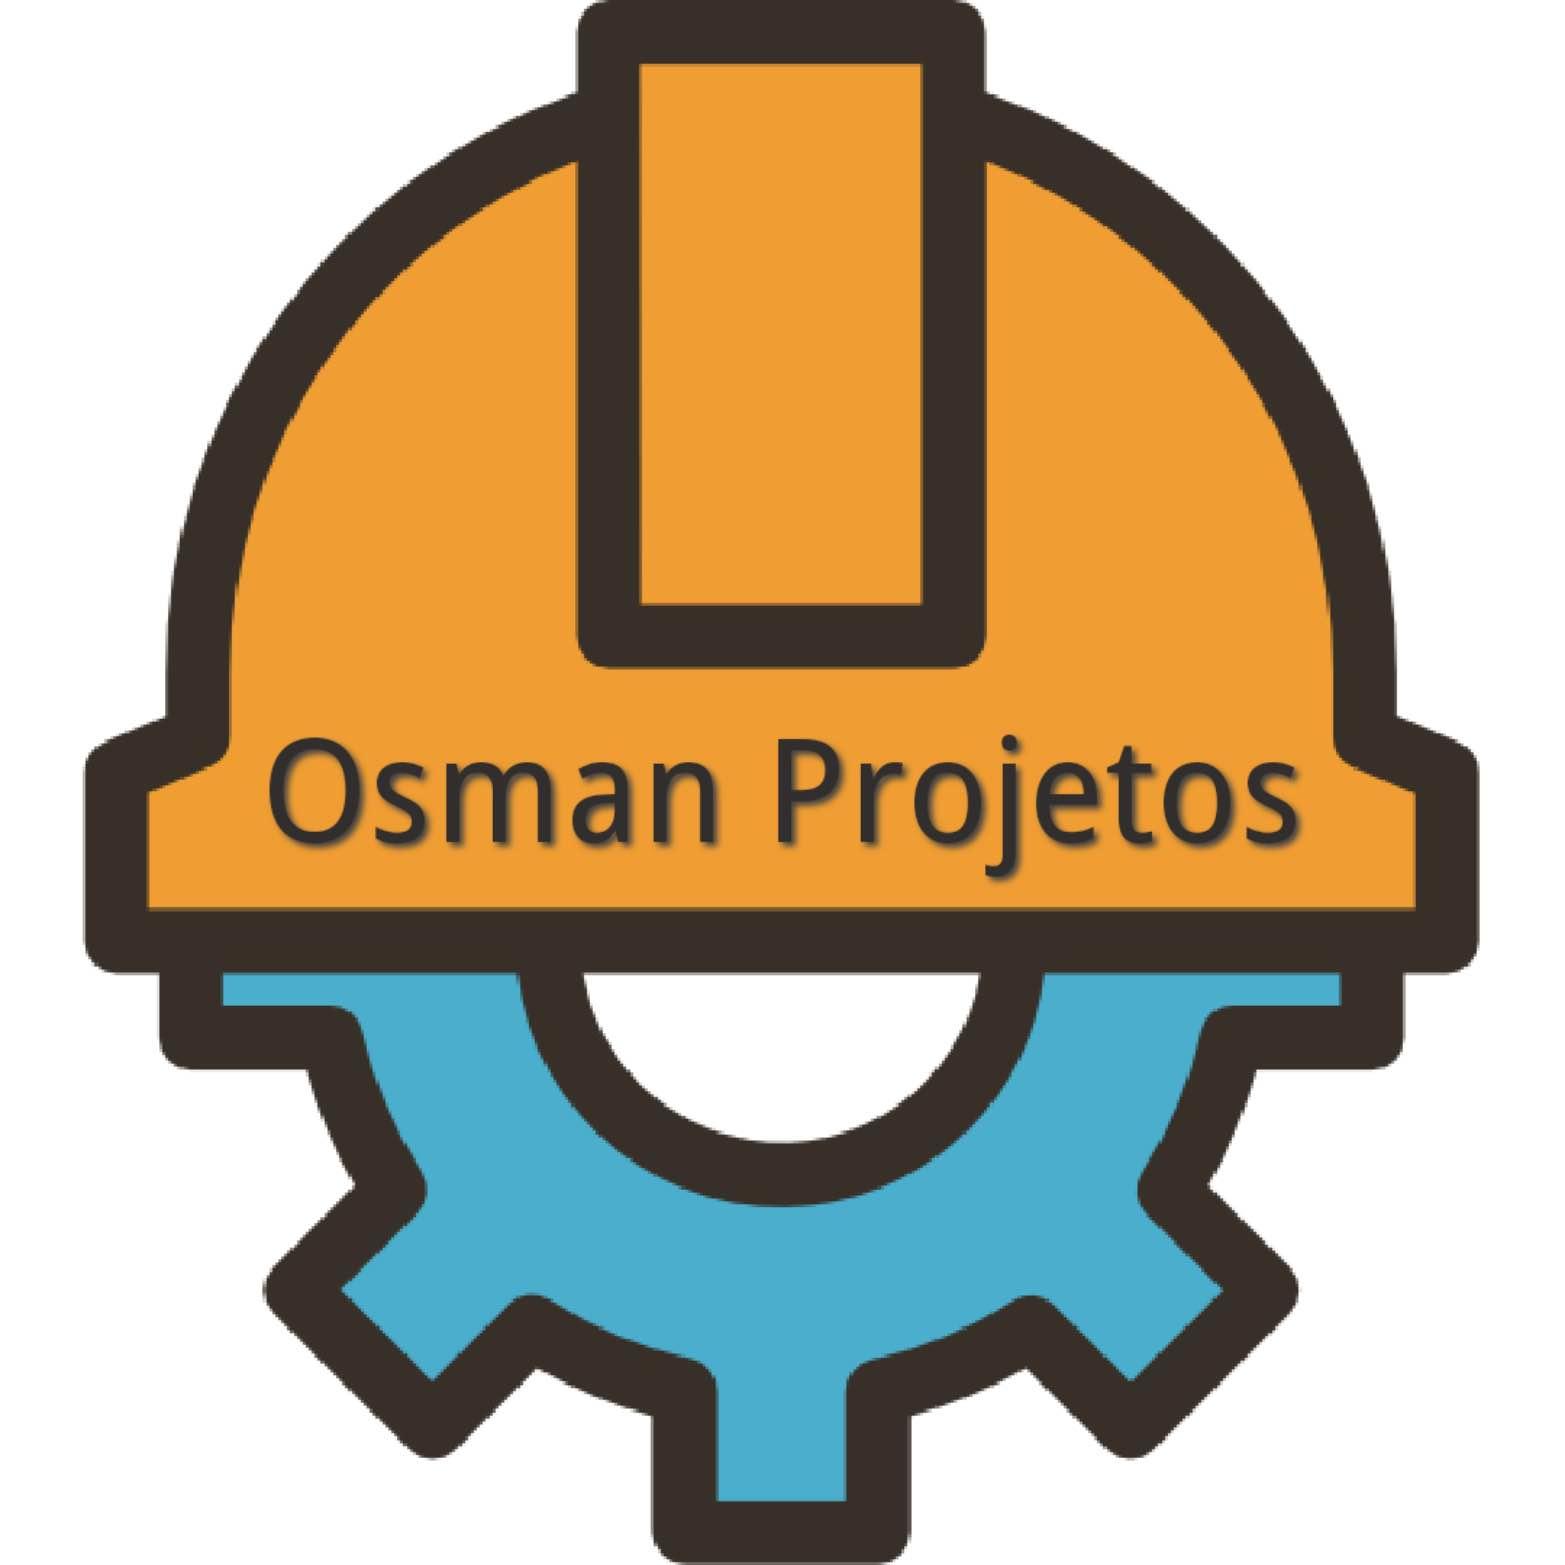 Osman projetos